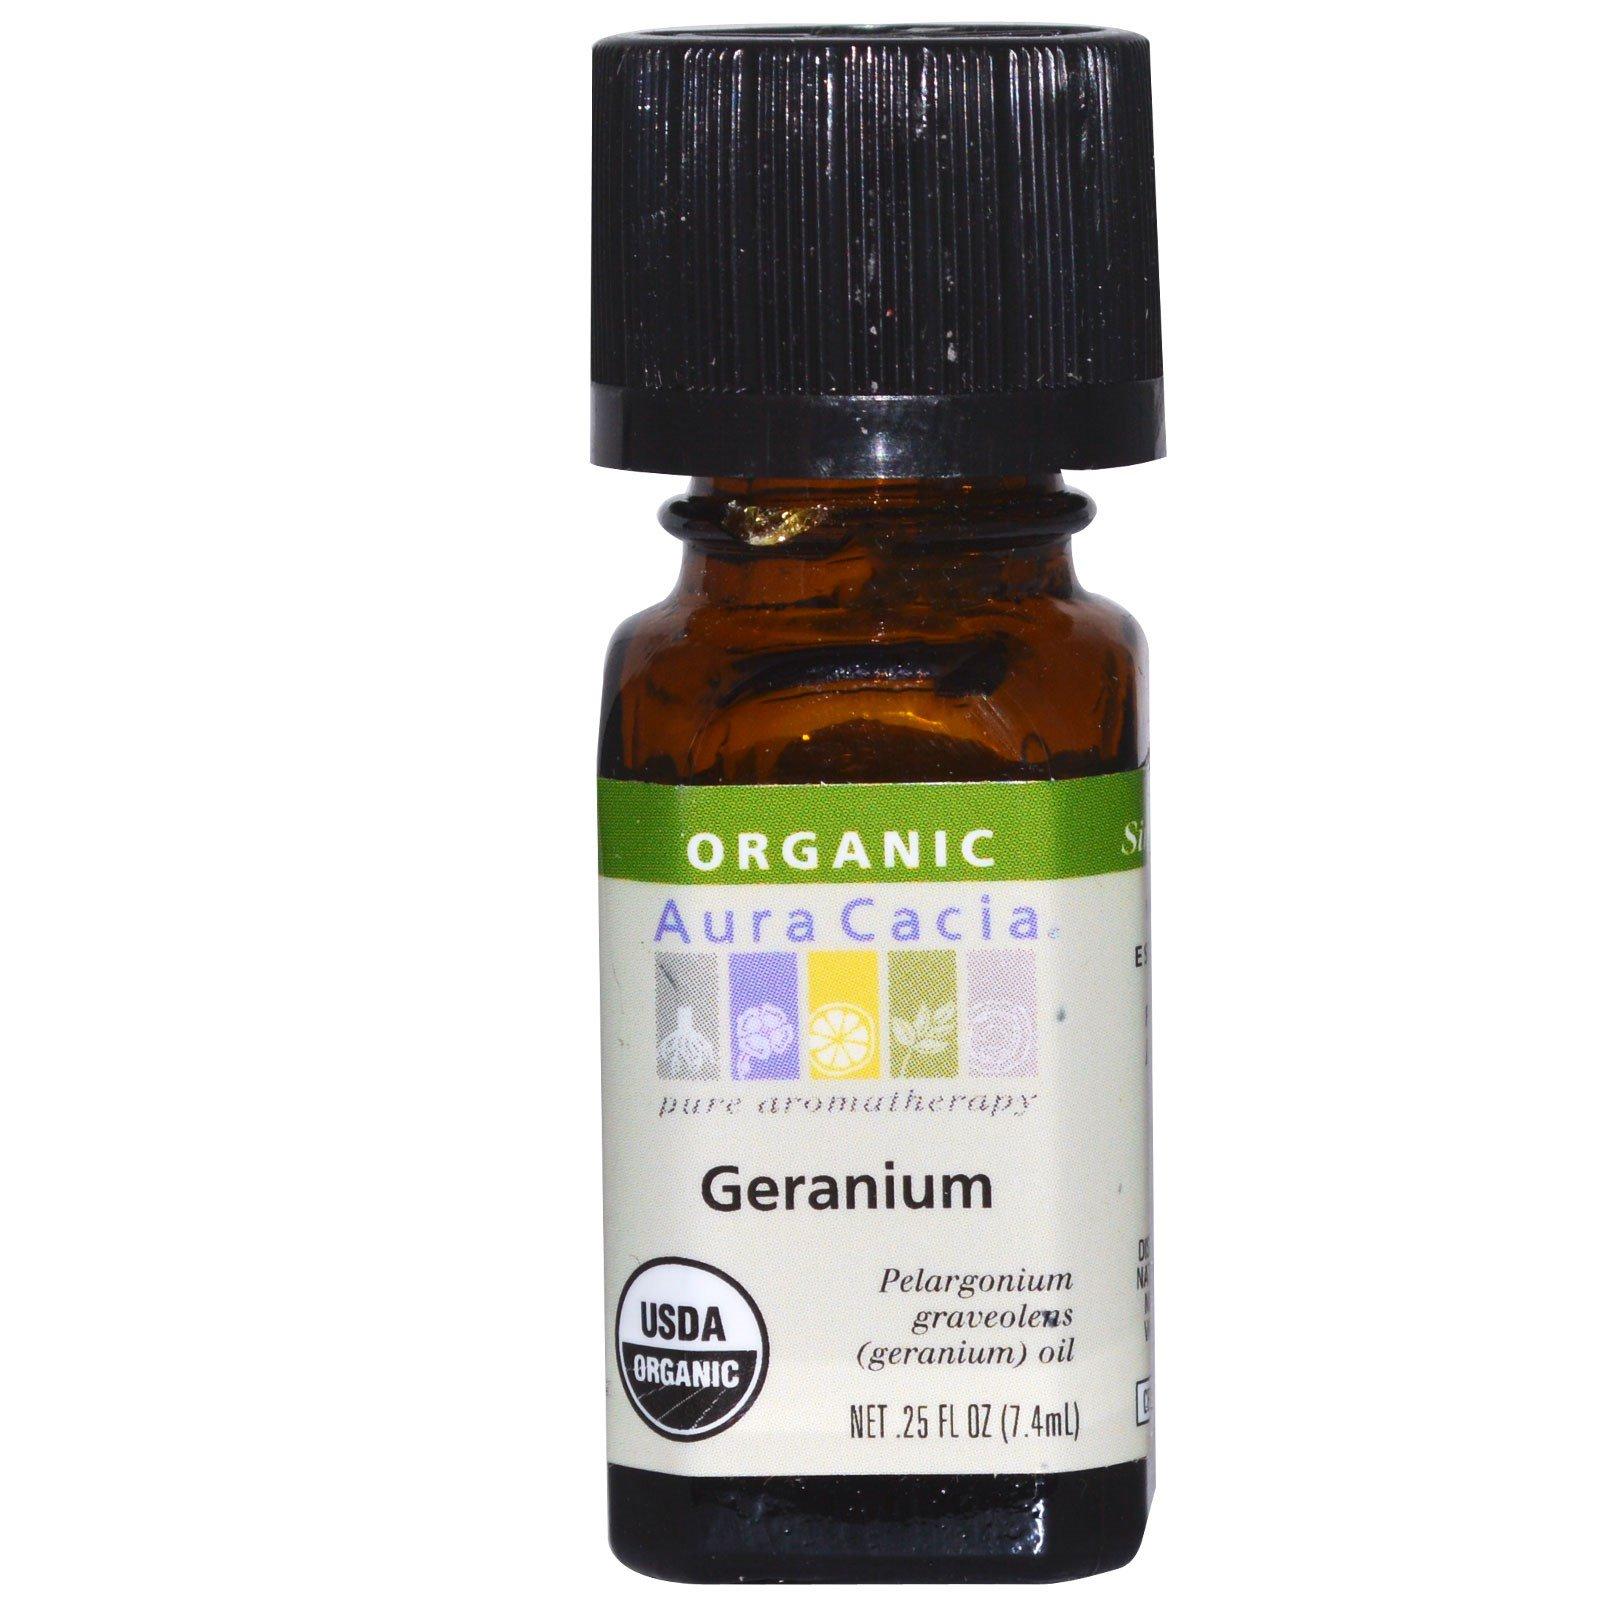 Aura Cacia, Organic, герань, 0,25 жидкой унции (7,4 мл)